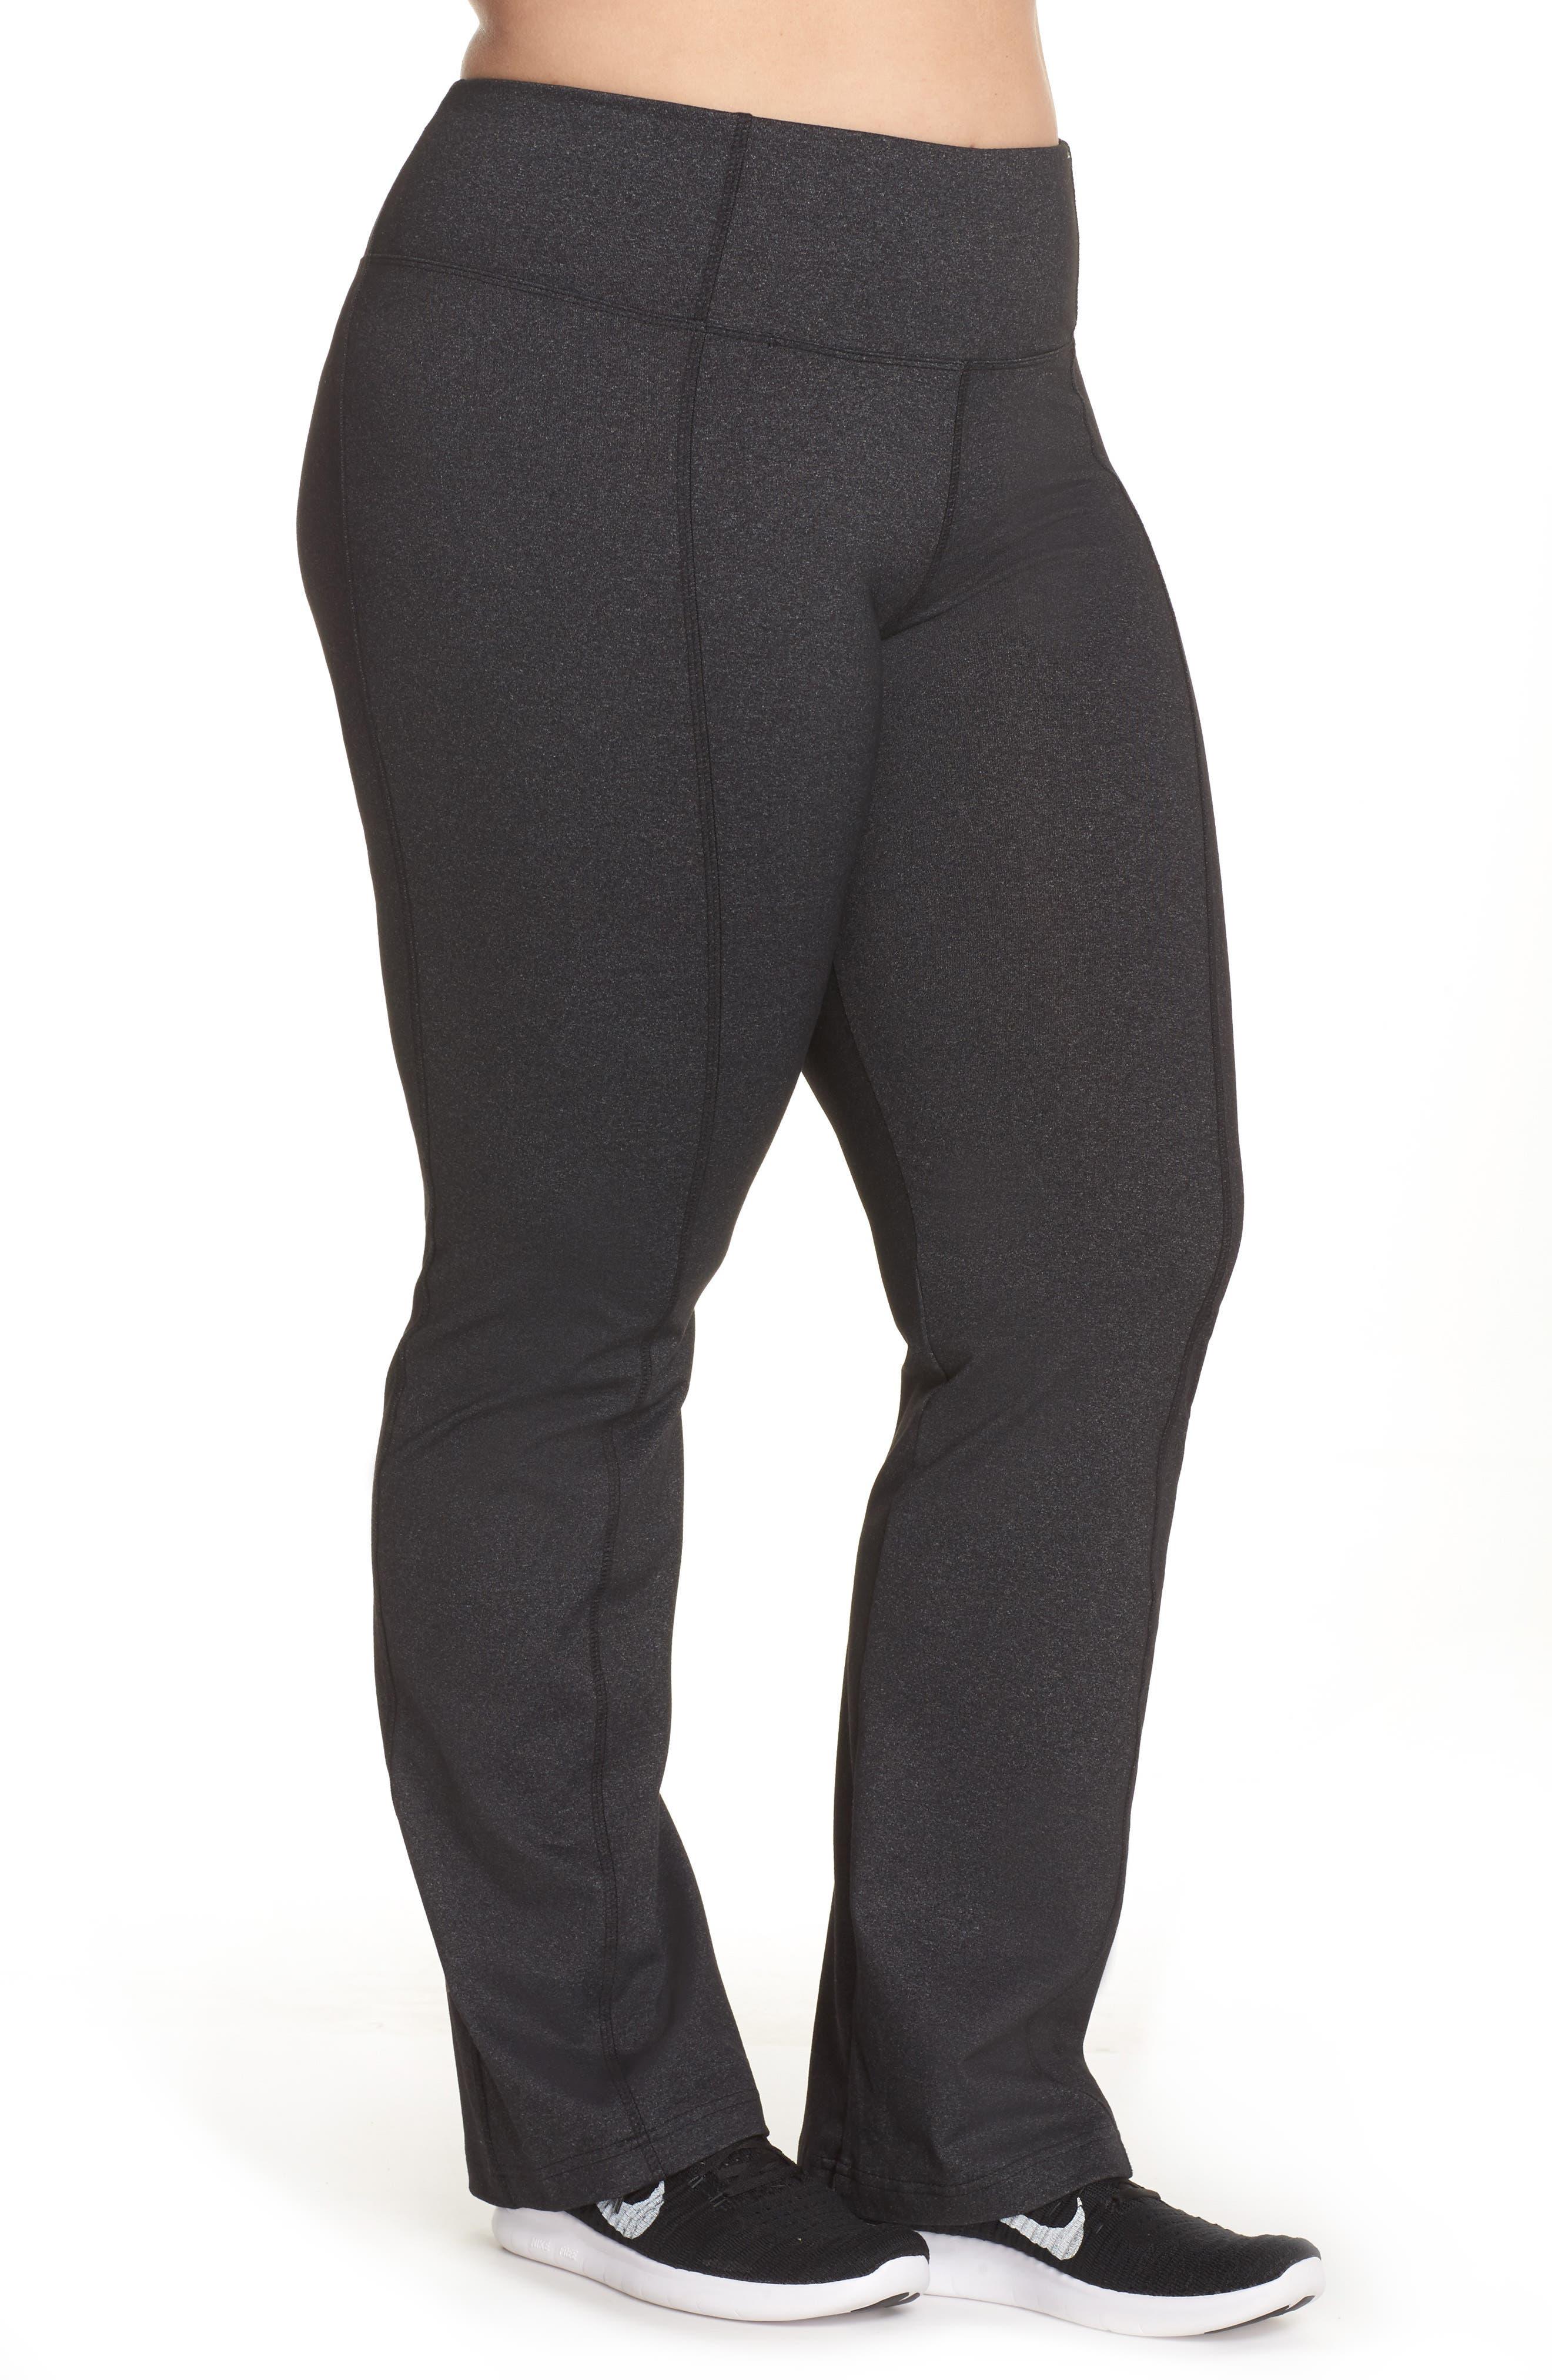 Alternate Image 3  - Marika Curves High Rise Control Top Bootcut Pants